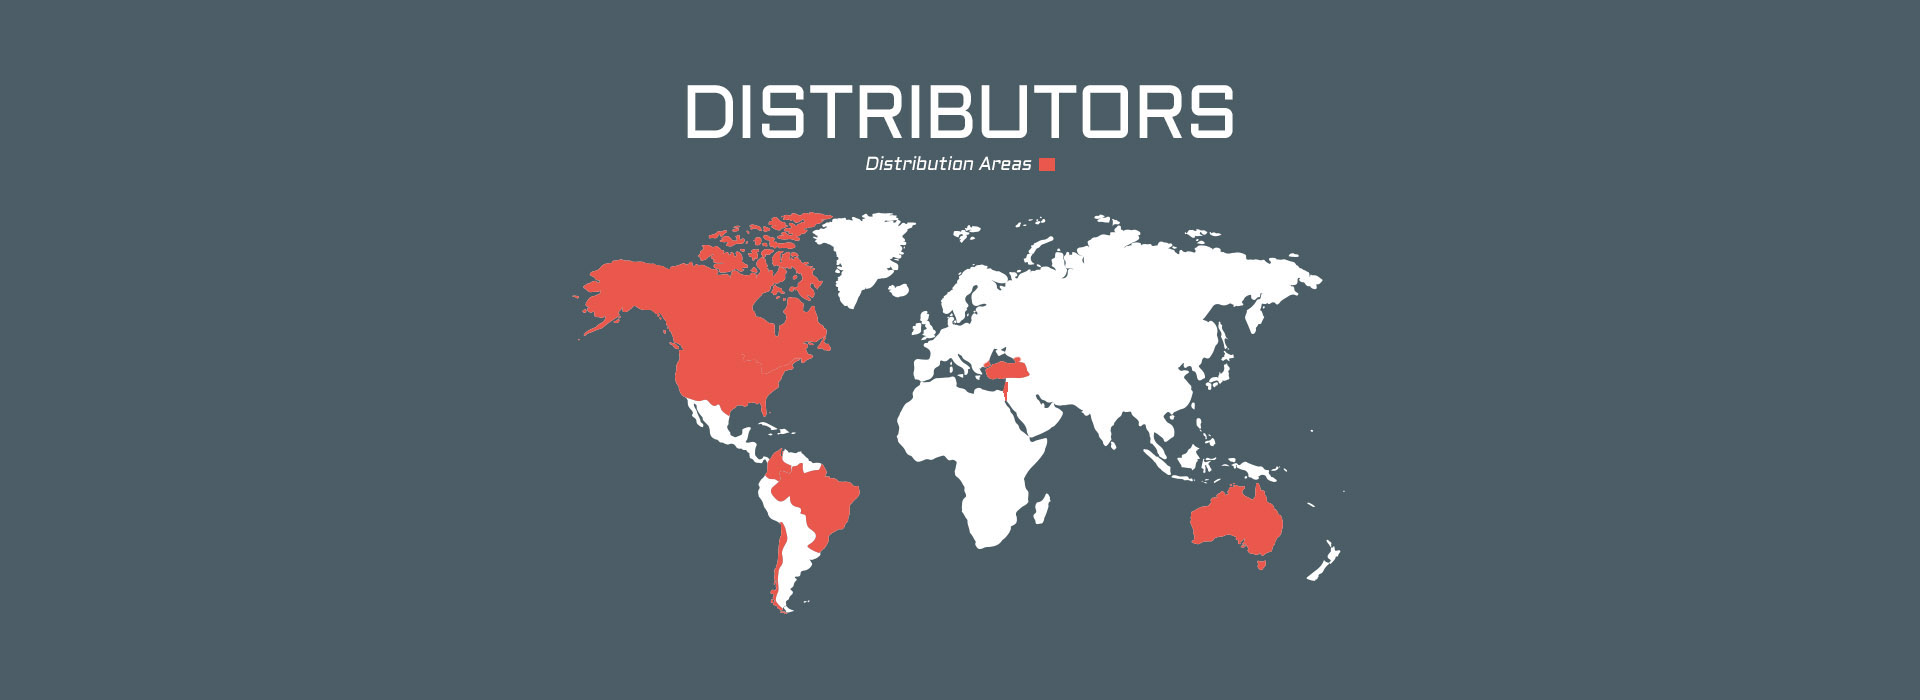 V3-FireIce-DistributorsAll